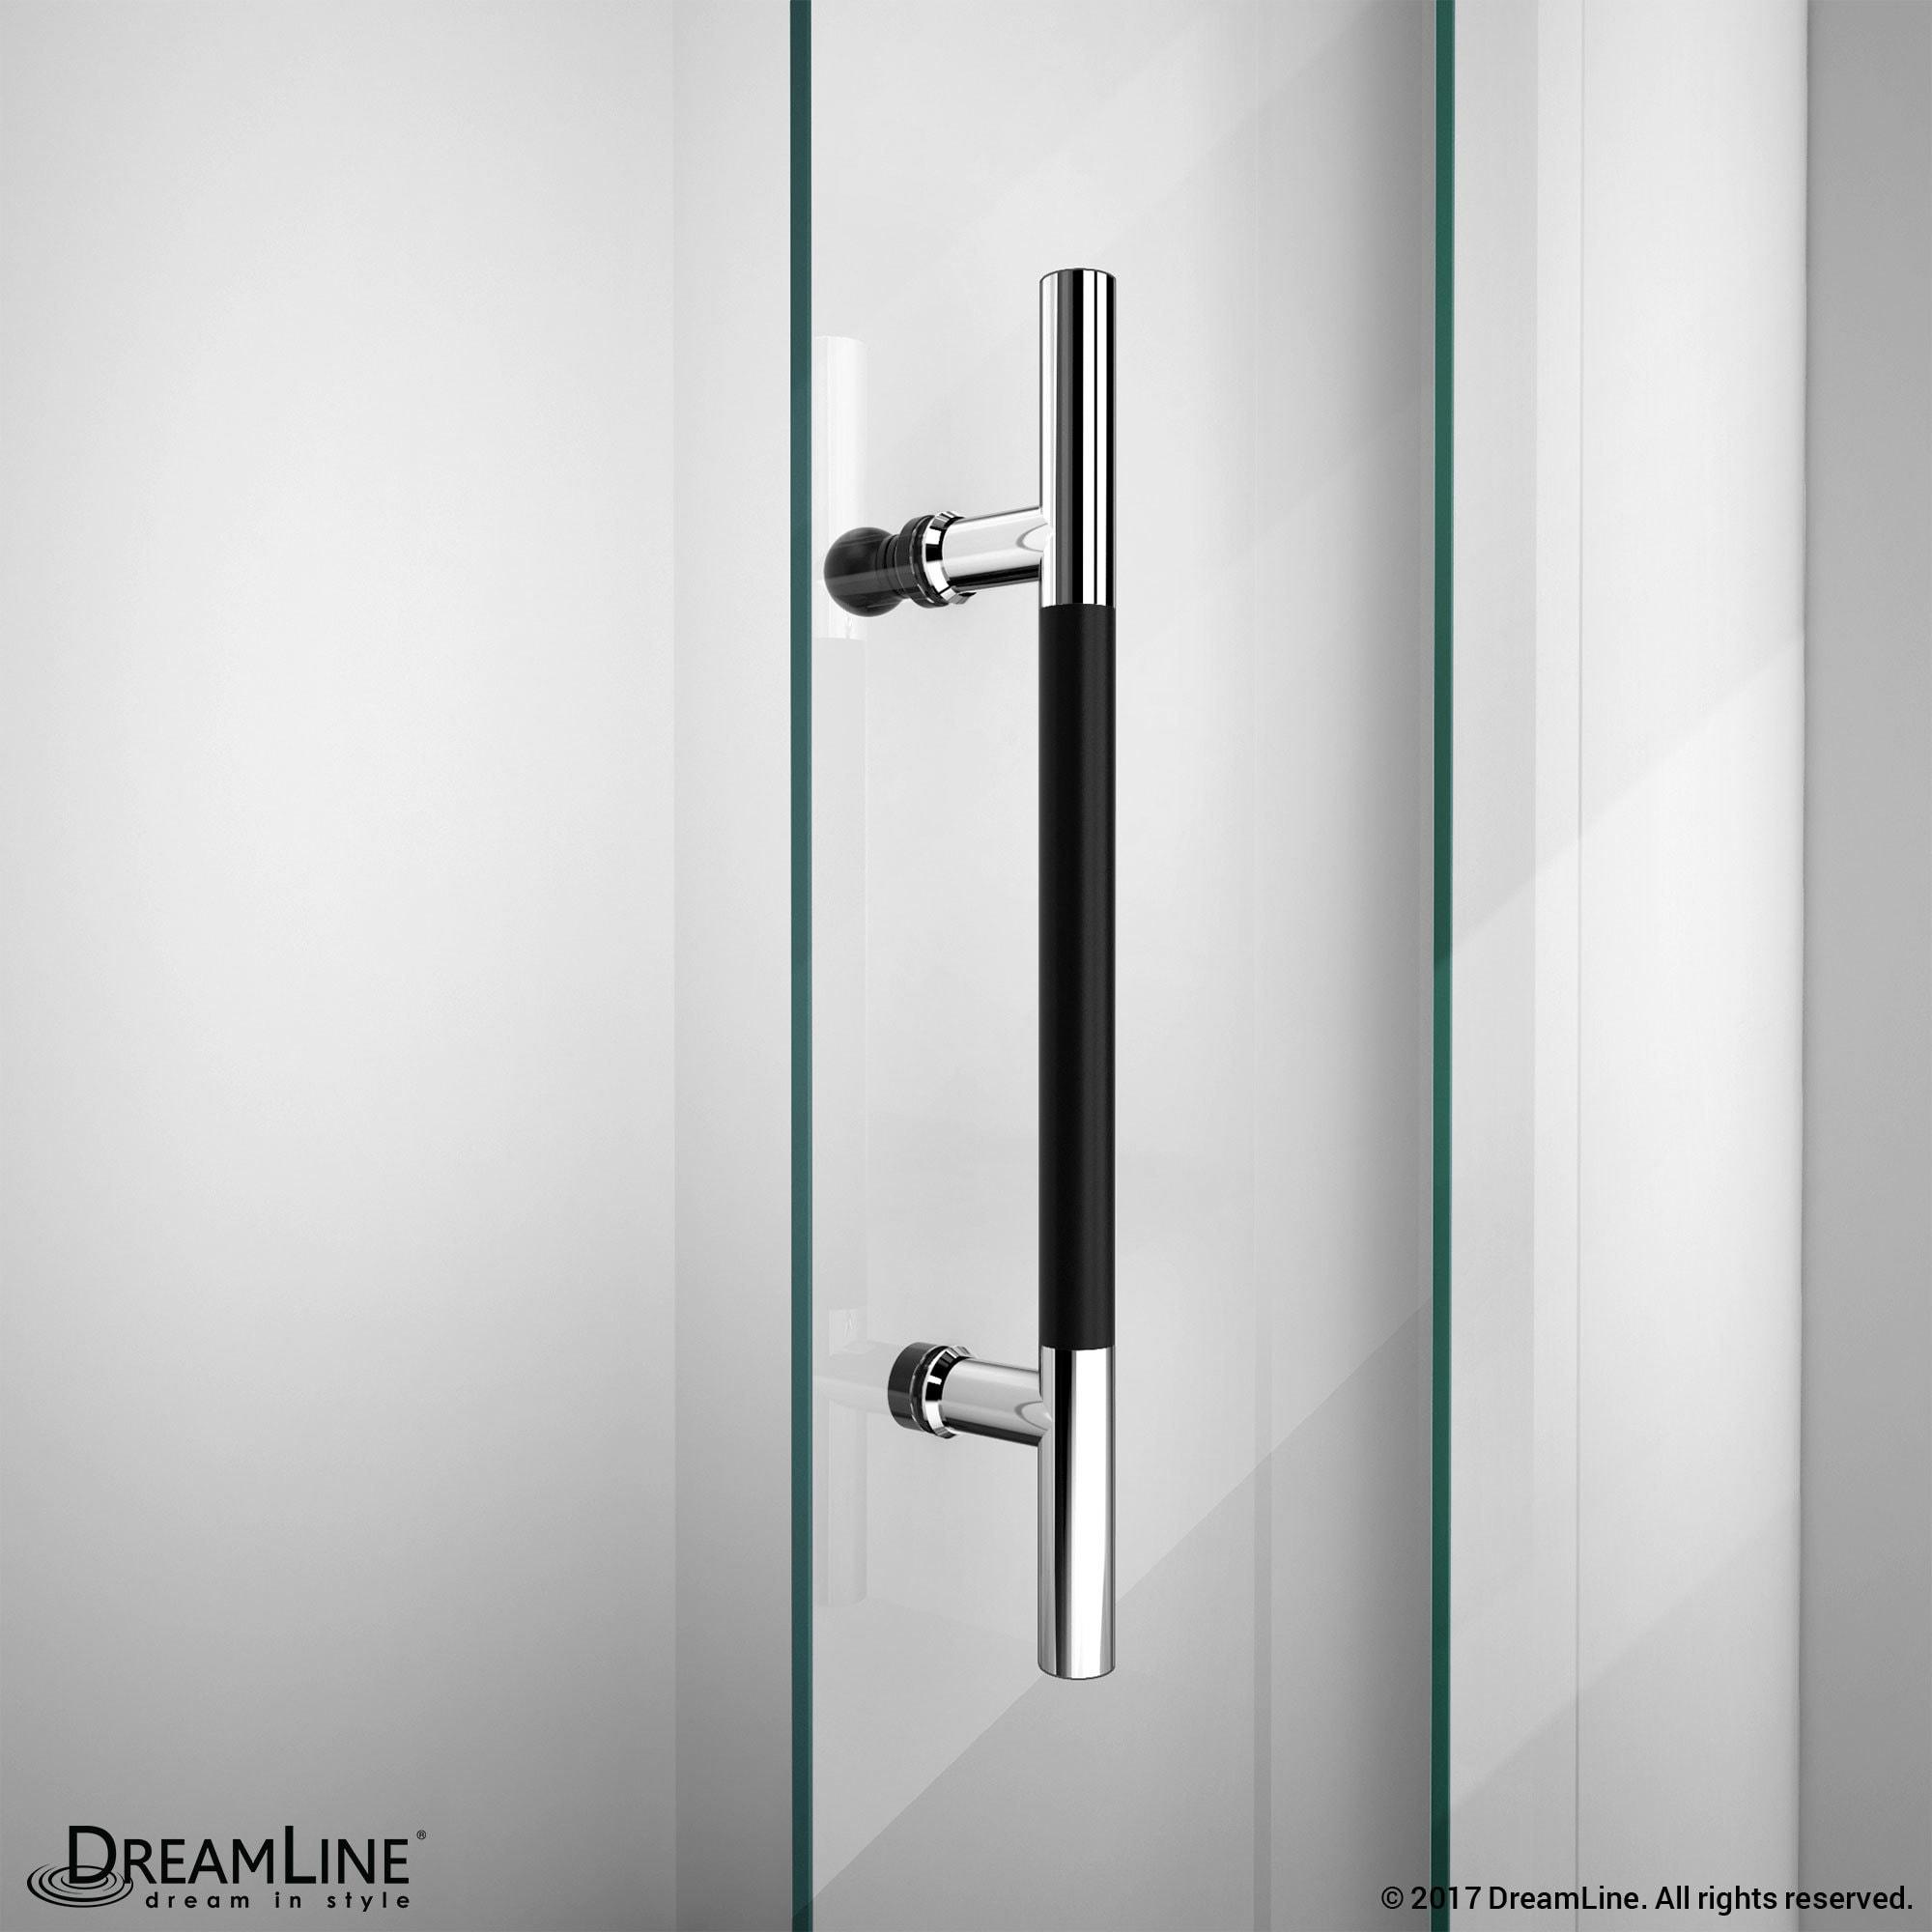 org splendid l shower handballtunisie antique effect brass images q b door handles